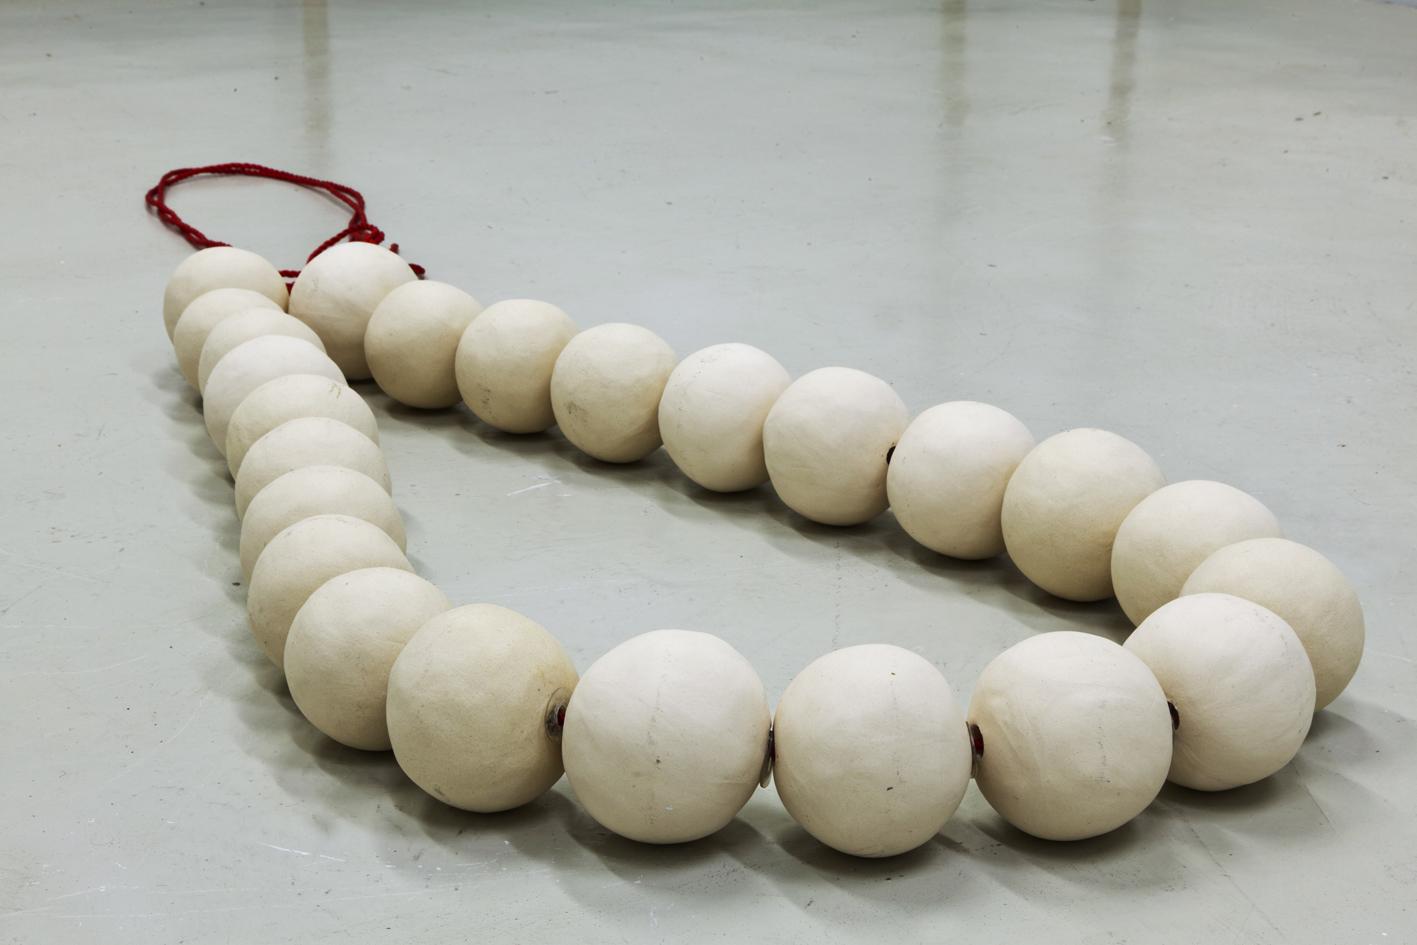 beads_new_MG_0127.jpg